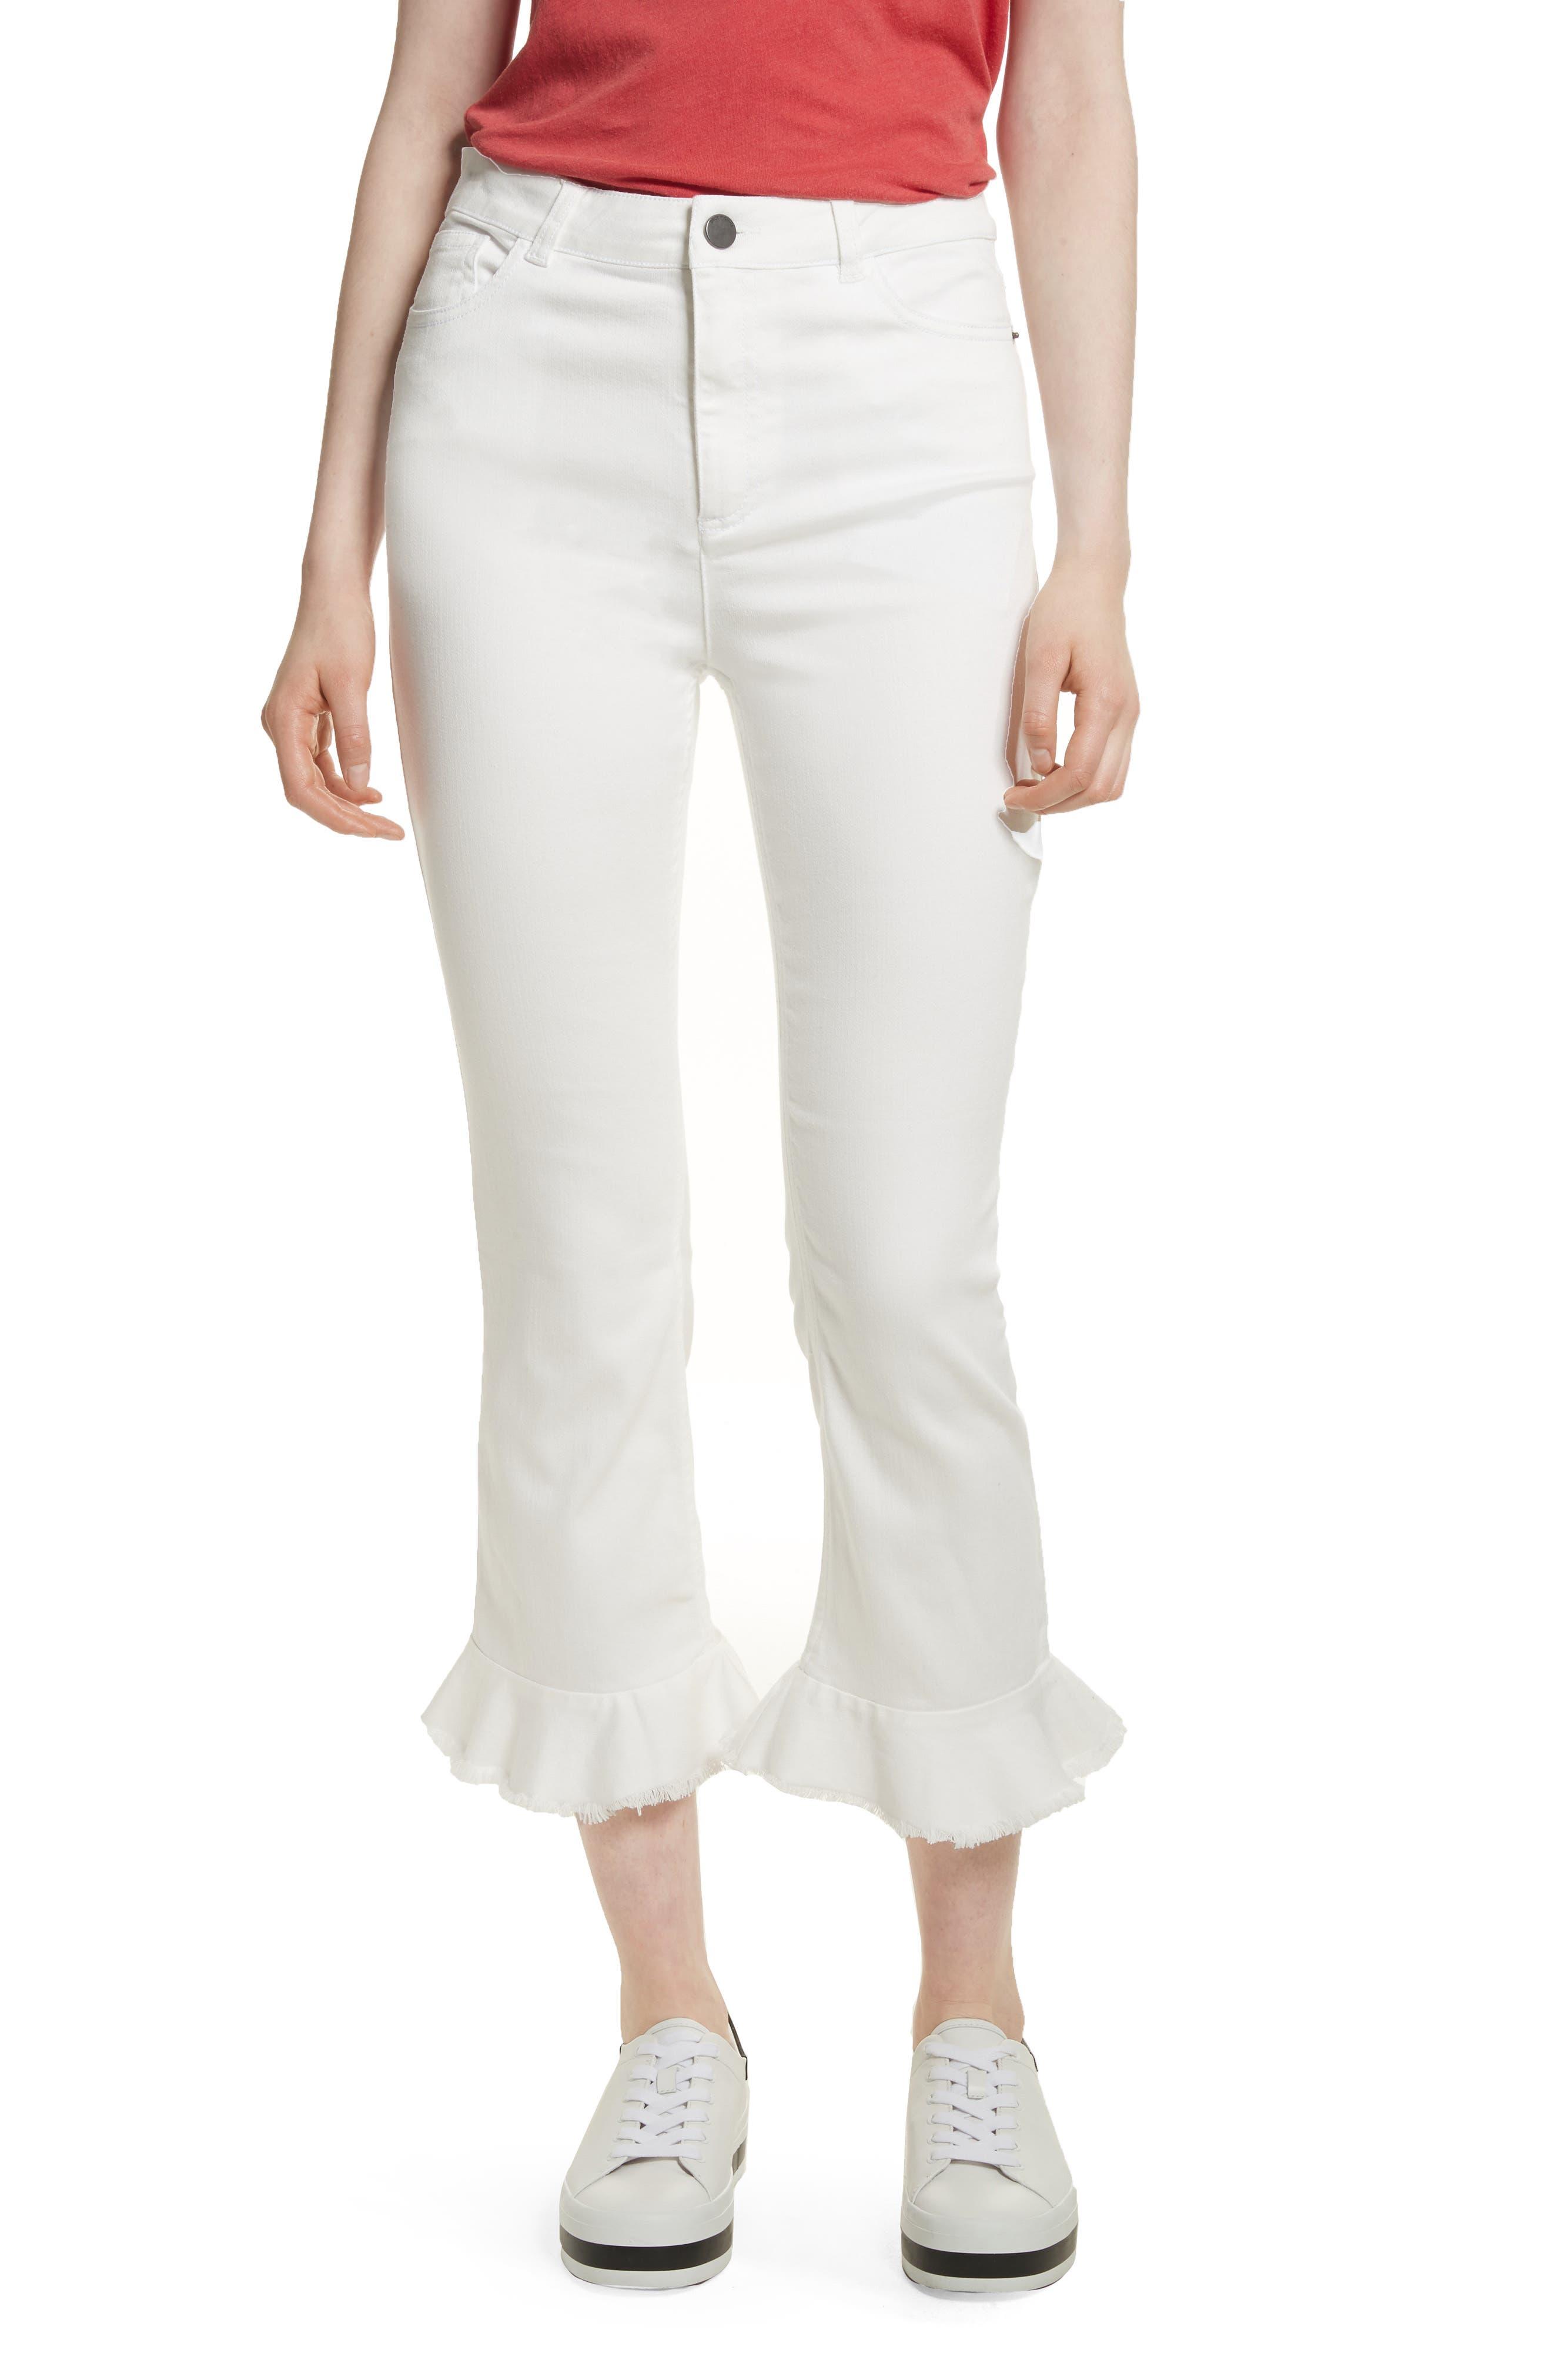 AO.LA Zoe Ruffle Hem Crop Jeans,                         Main,                         color, White